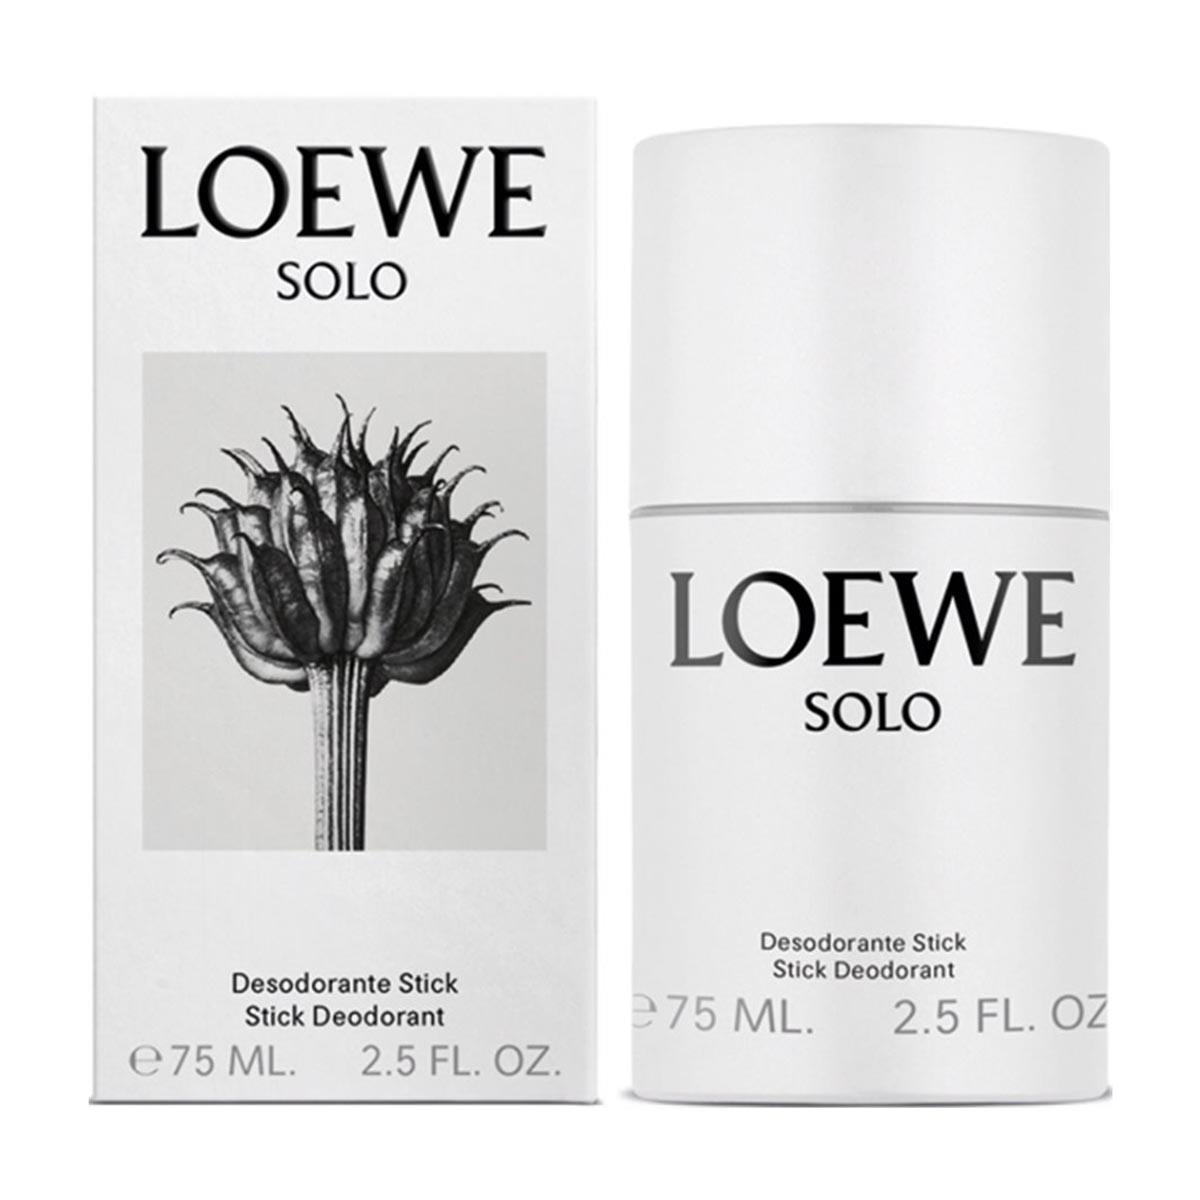 Loewe solo desodorante stick 75ml